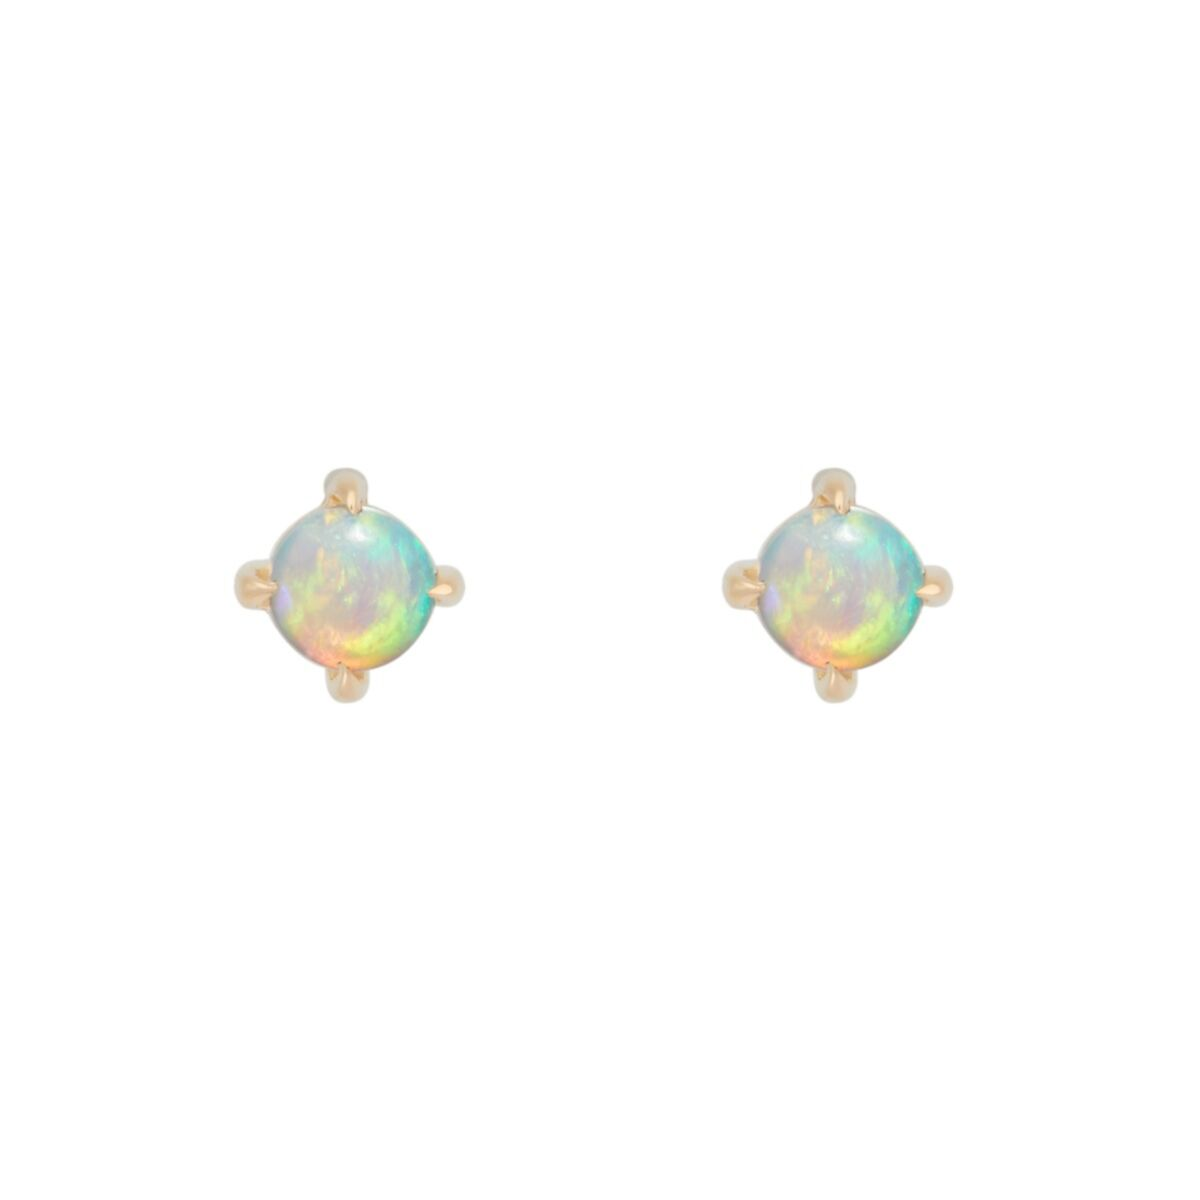 Sleeping Beauty Opal Stud (SINGLE) image